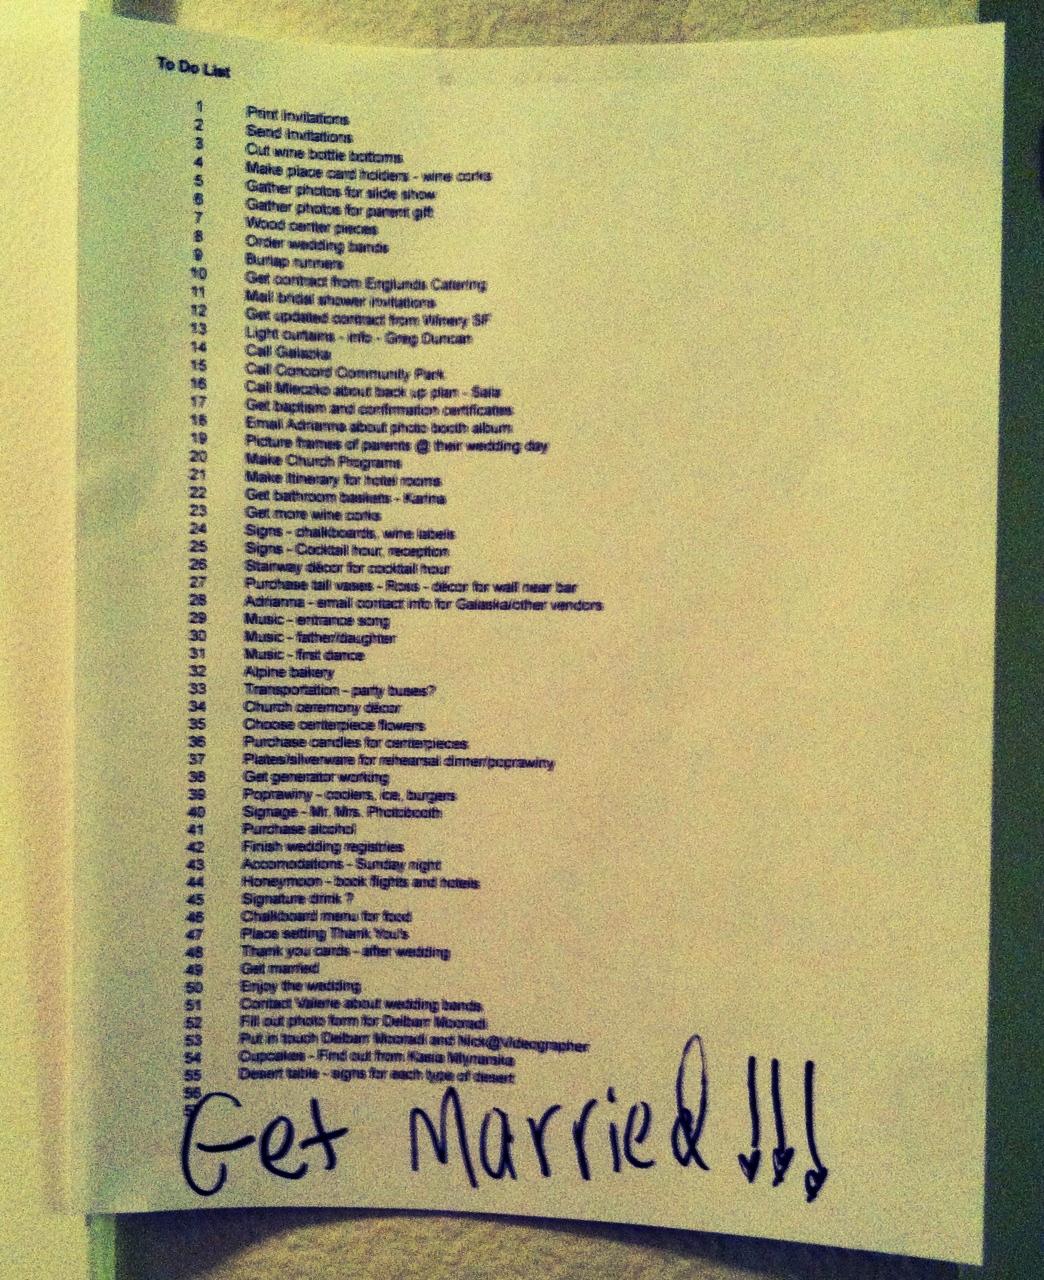 Wedding To Do List: My Big Fat Polish Wedding: The Endless To-Do List